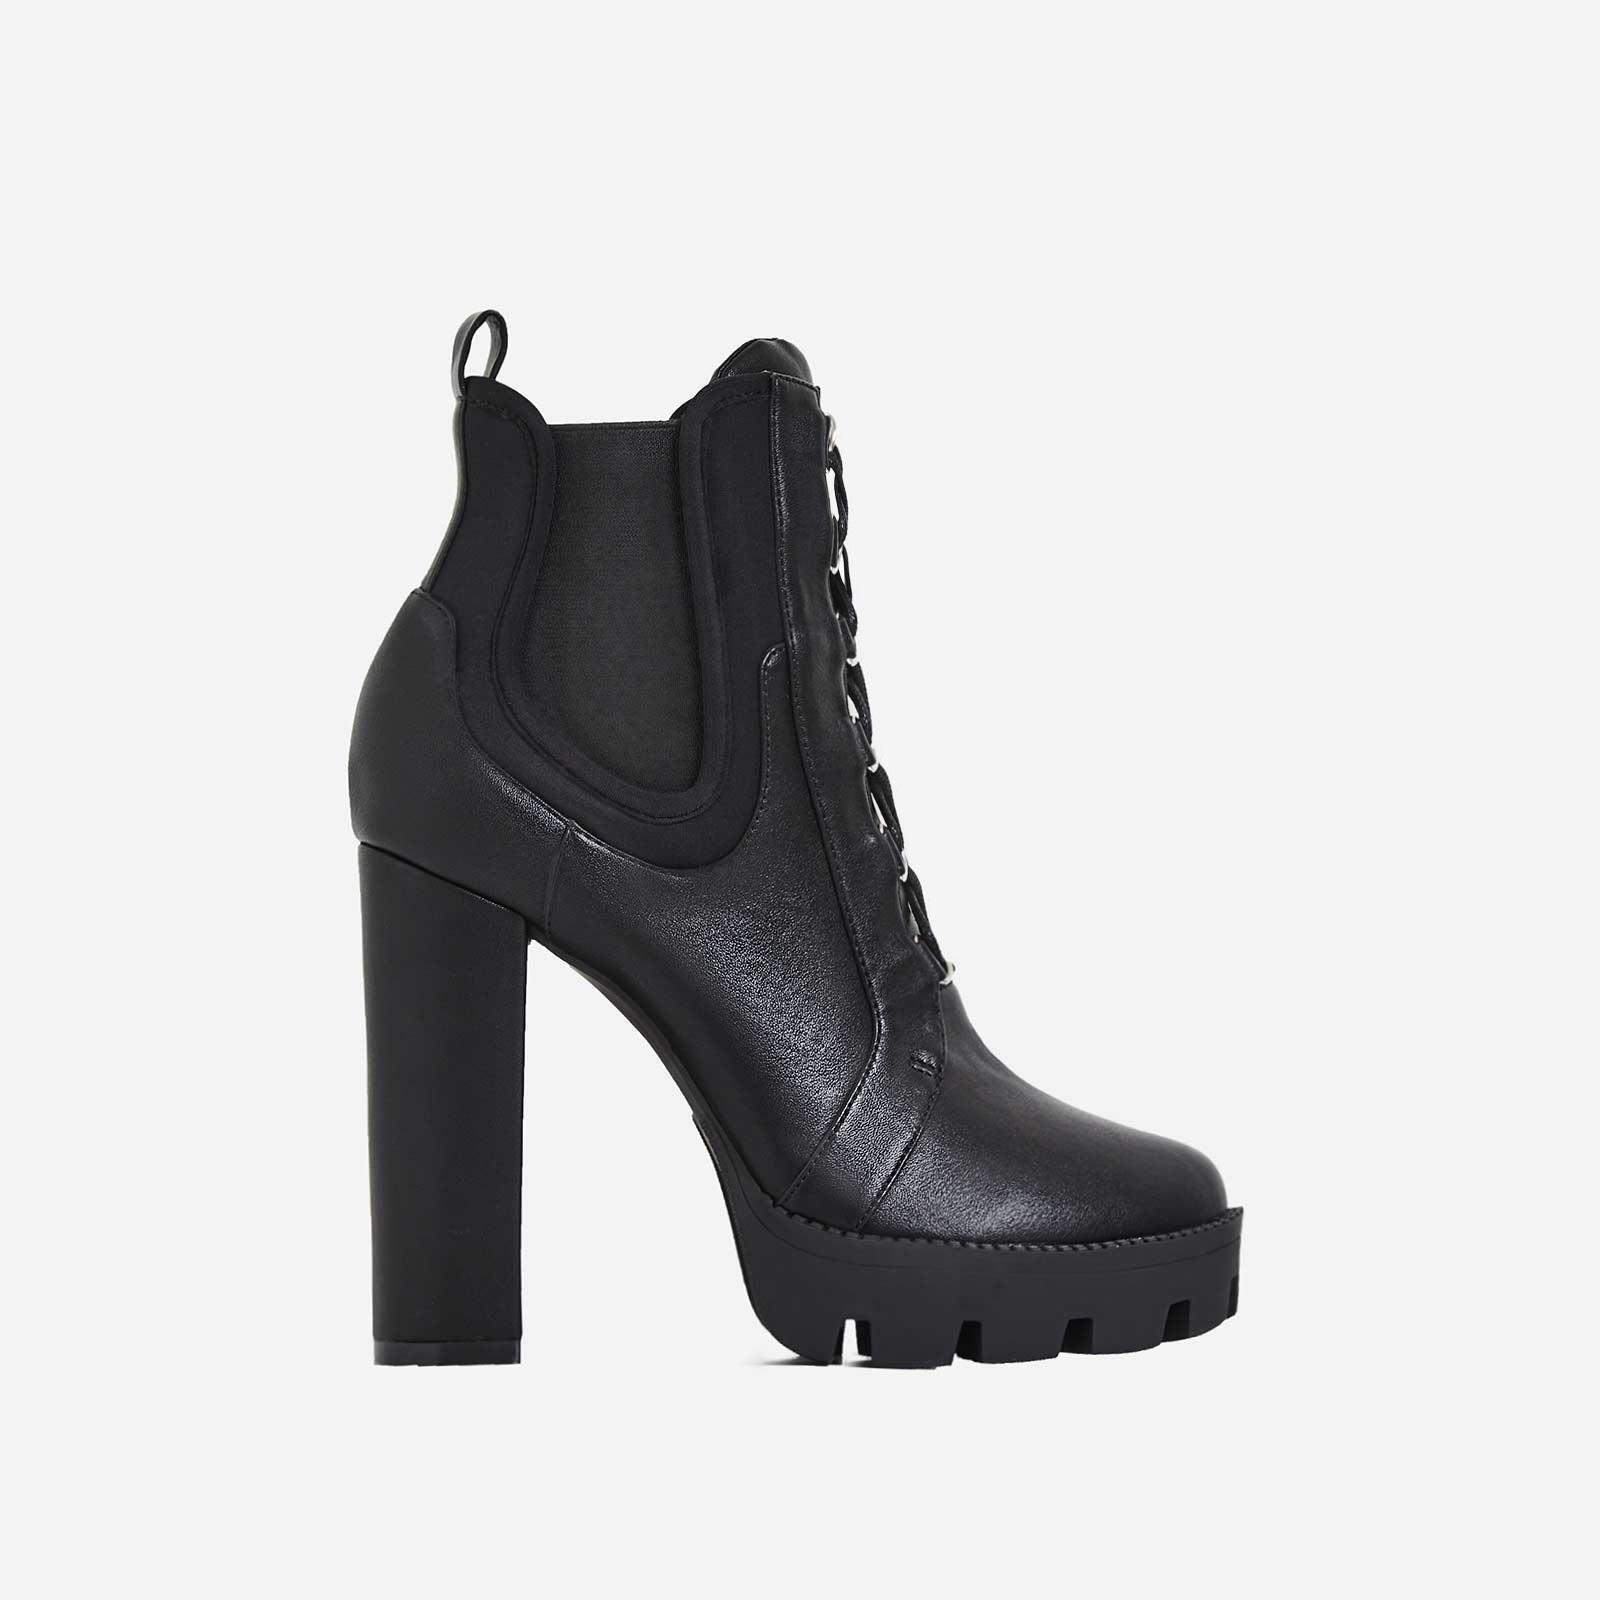 Miya Black Lycra Trim Lace Up Platform Ankle Boot In Black Faux Leather